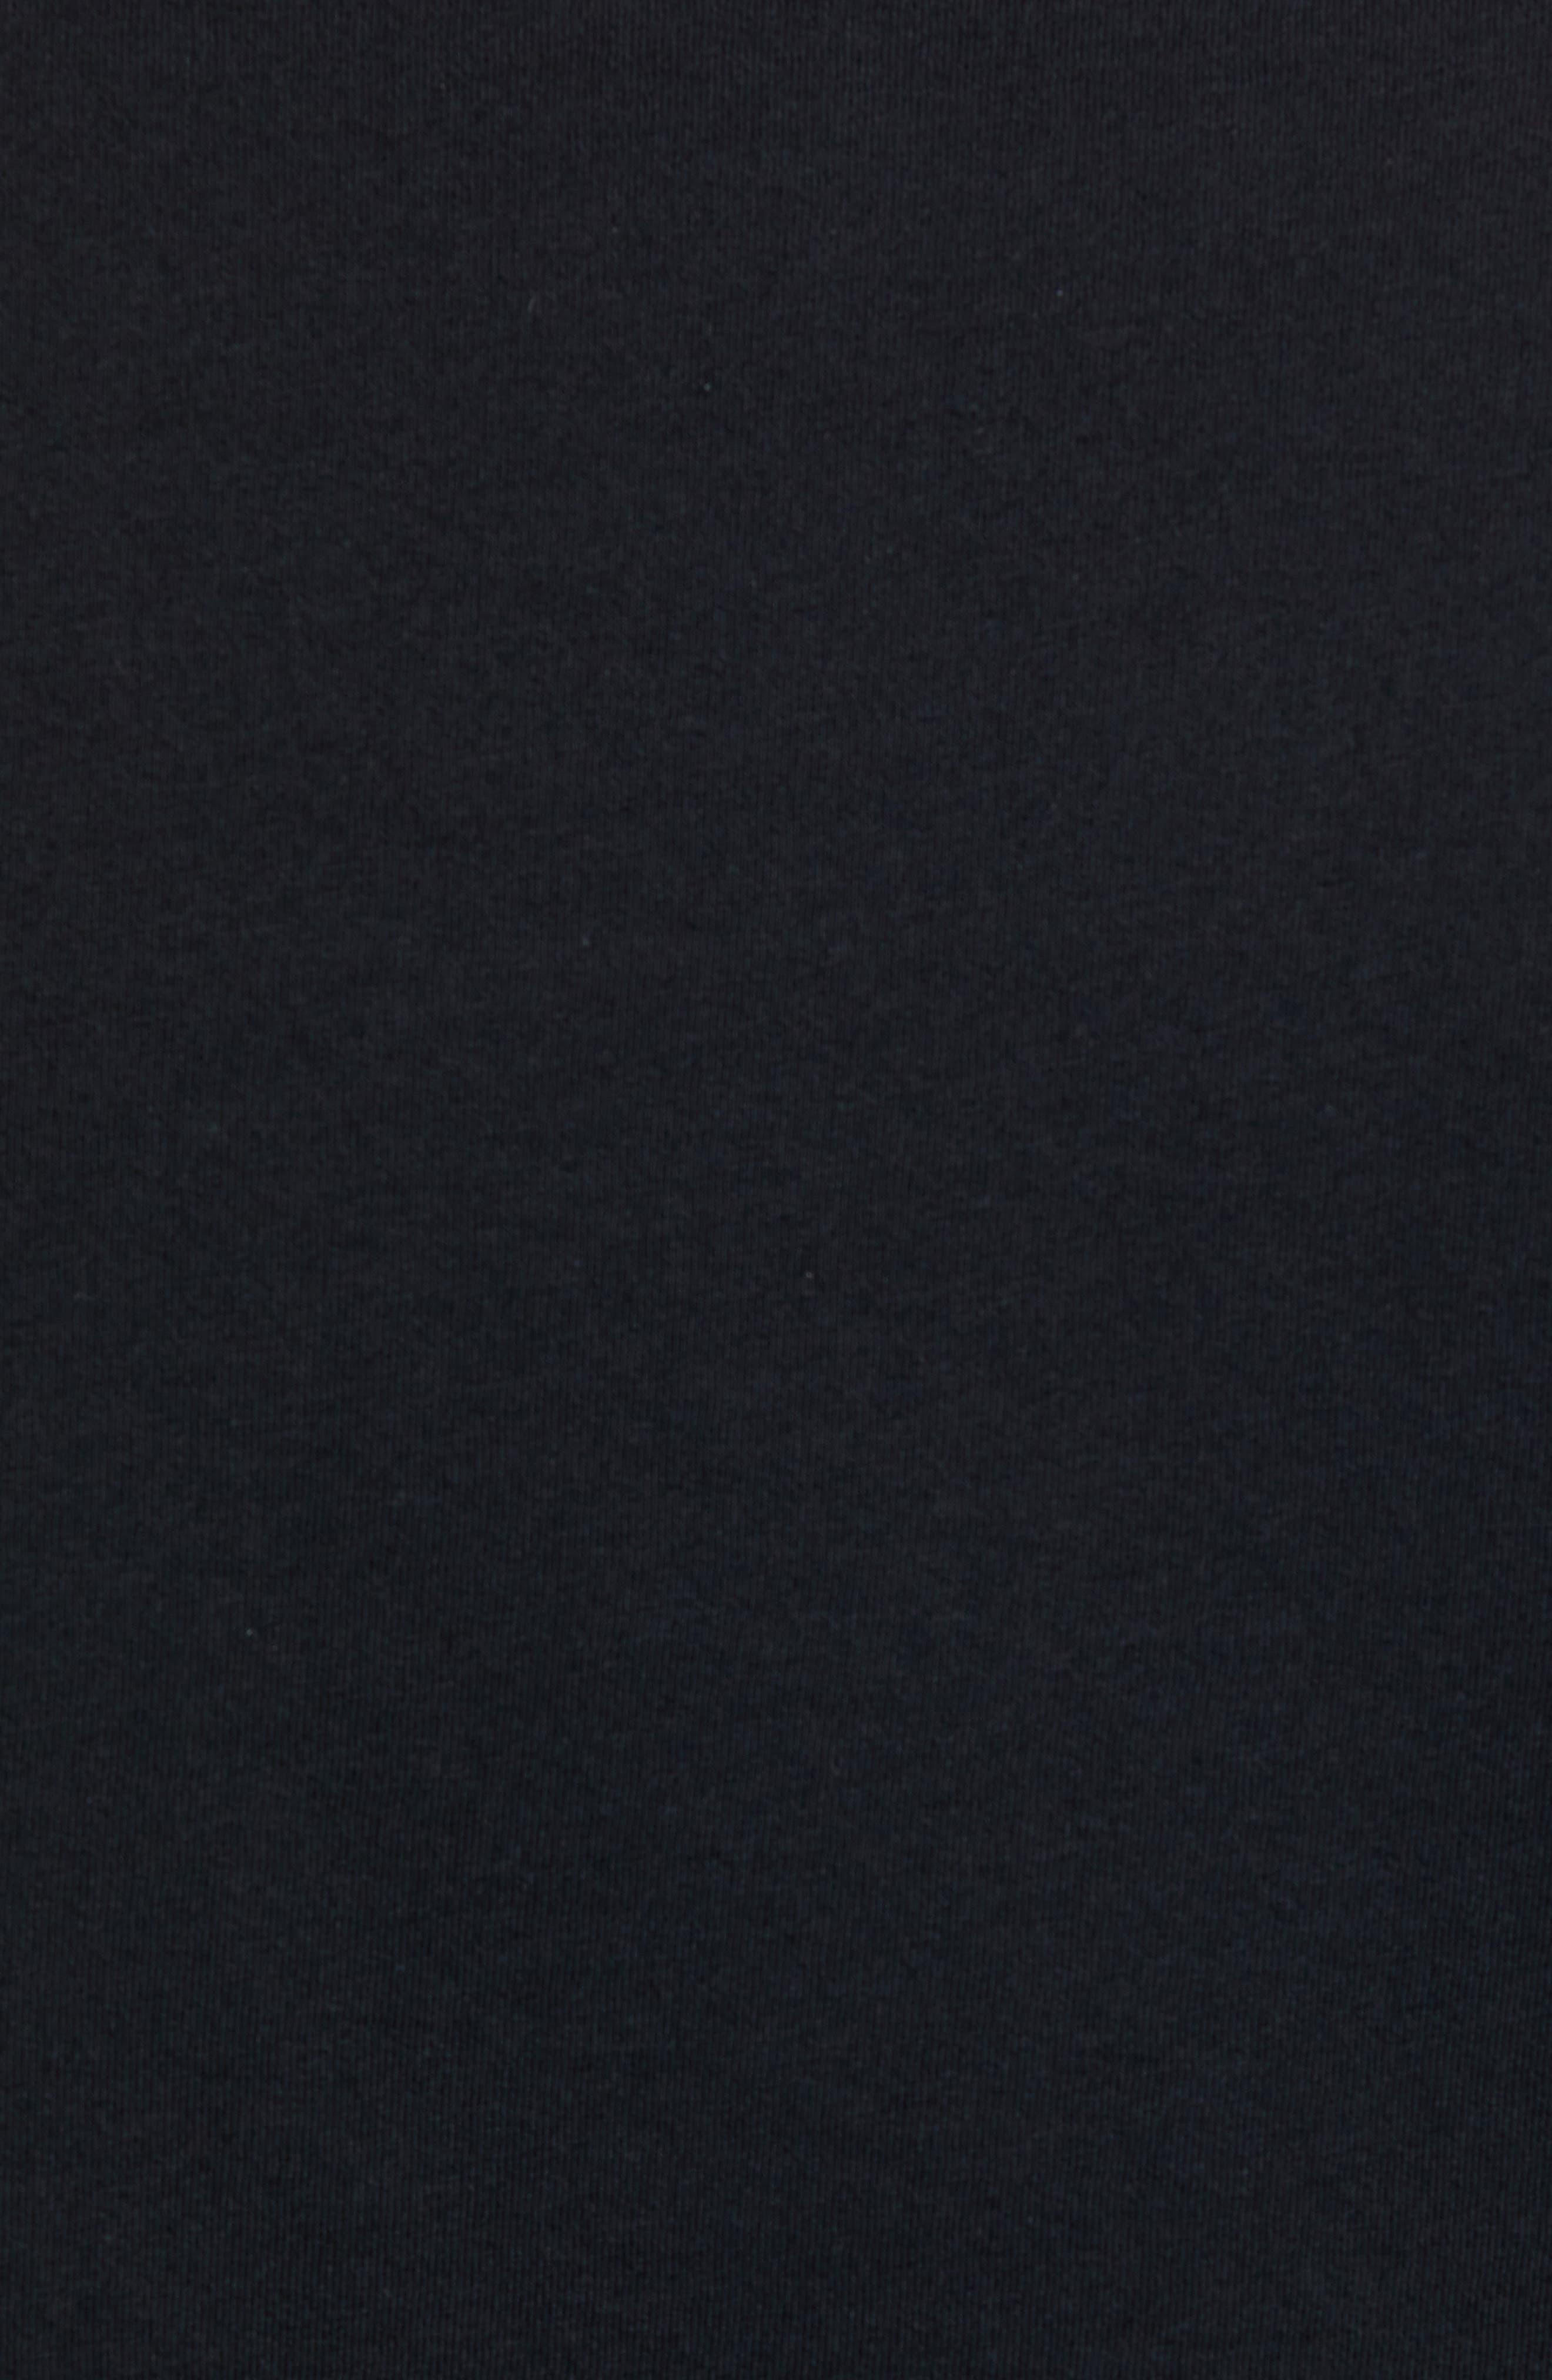 Flying Fish Organic Cotton T-Shirt,                             Alternate thumbnail 5, color,                             BLACK/ ALBANIAN LANDSCAPE